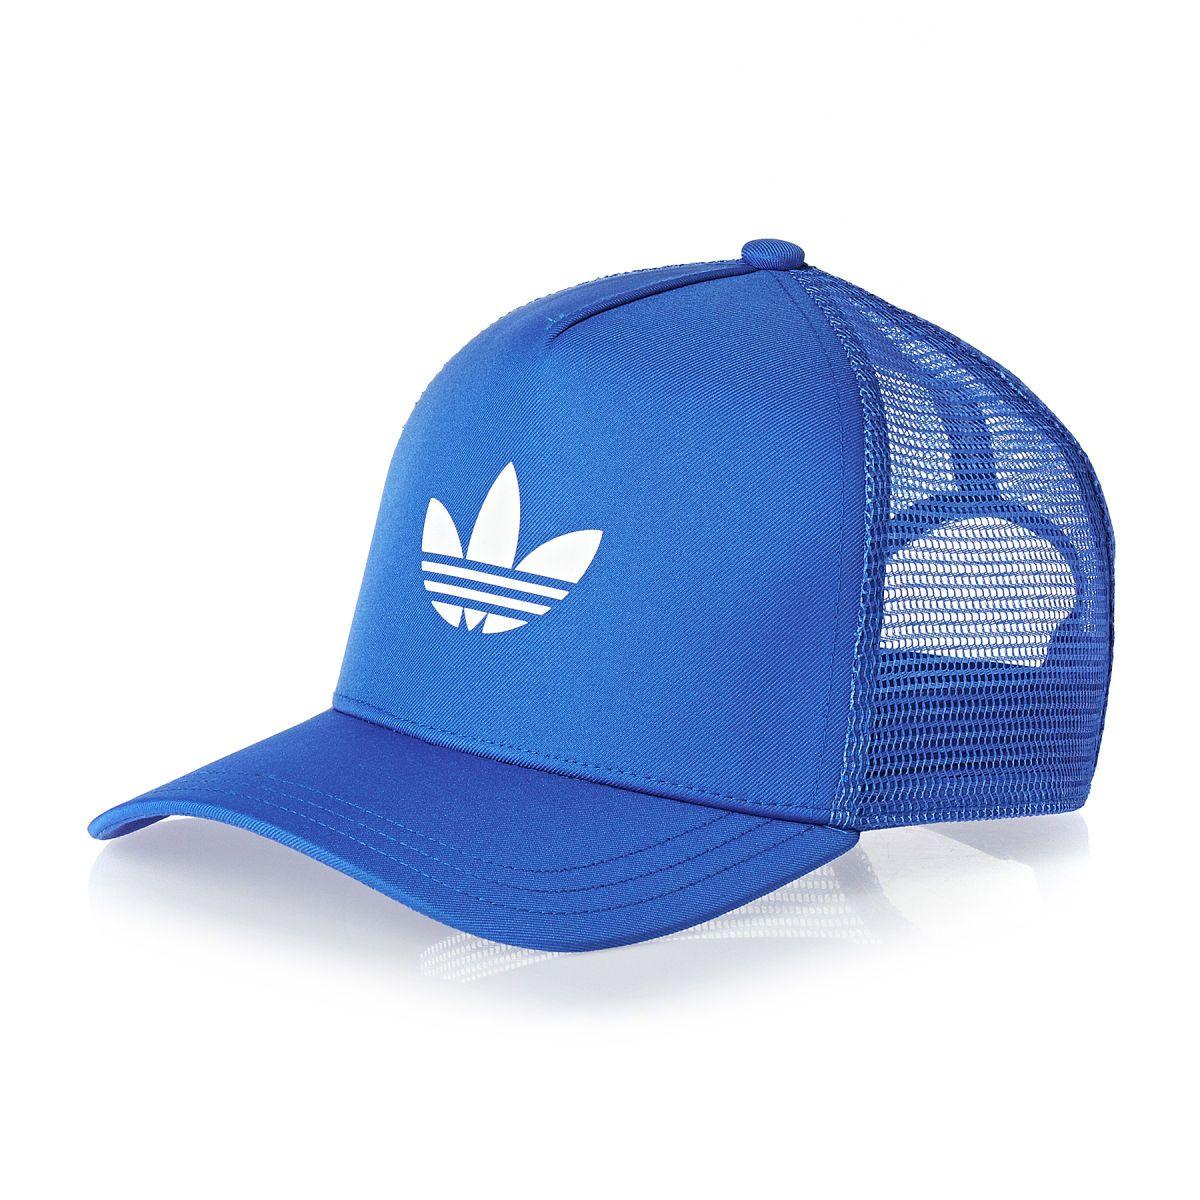 purchase cheap 5144d 0f8d2 cap adidas originals,adidas Originals Caps light grey liked on Polyvore  featuring accessories, hats,caps,